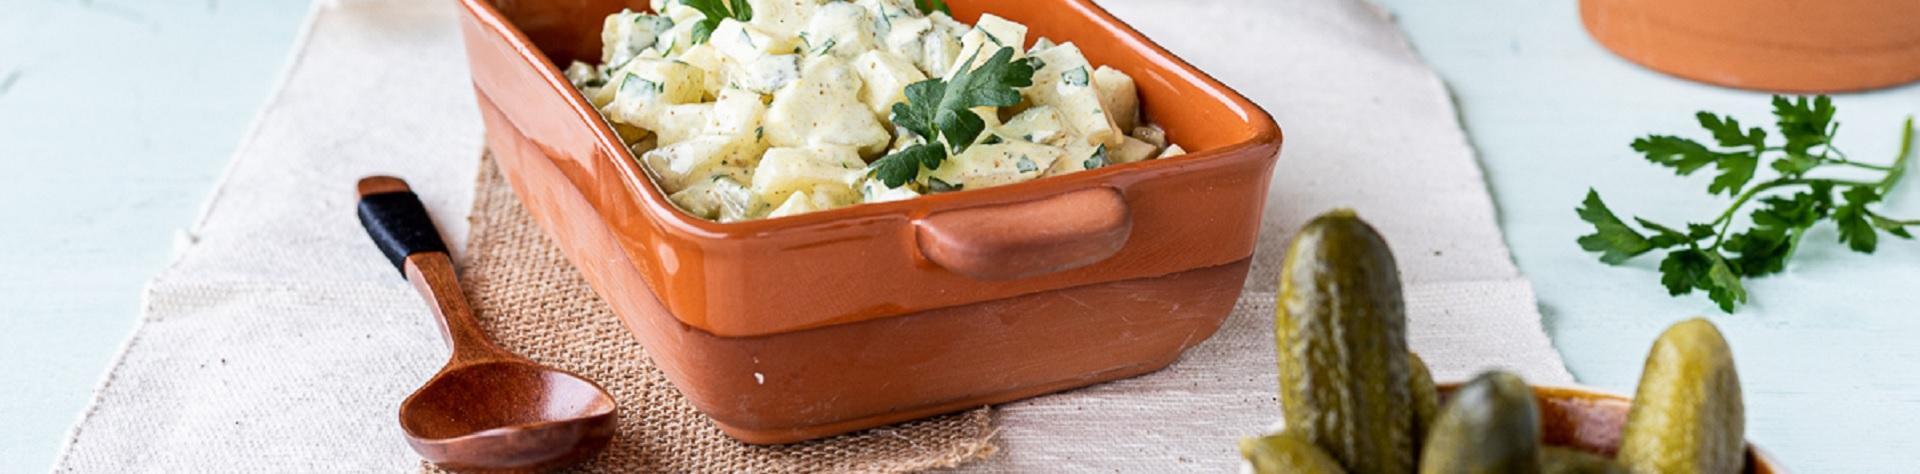 Salat-Slider